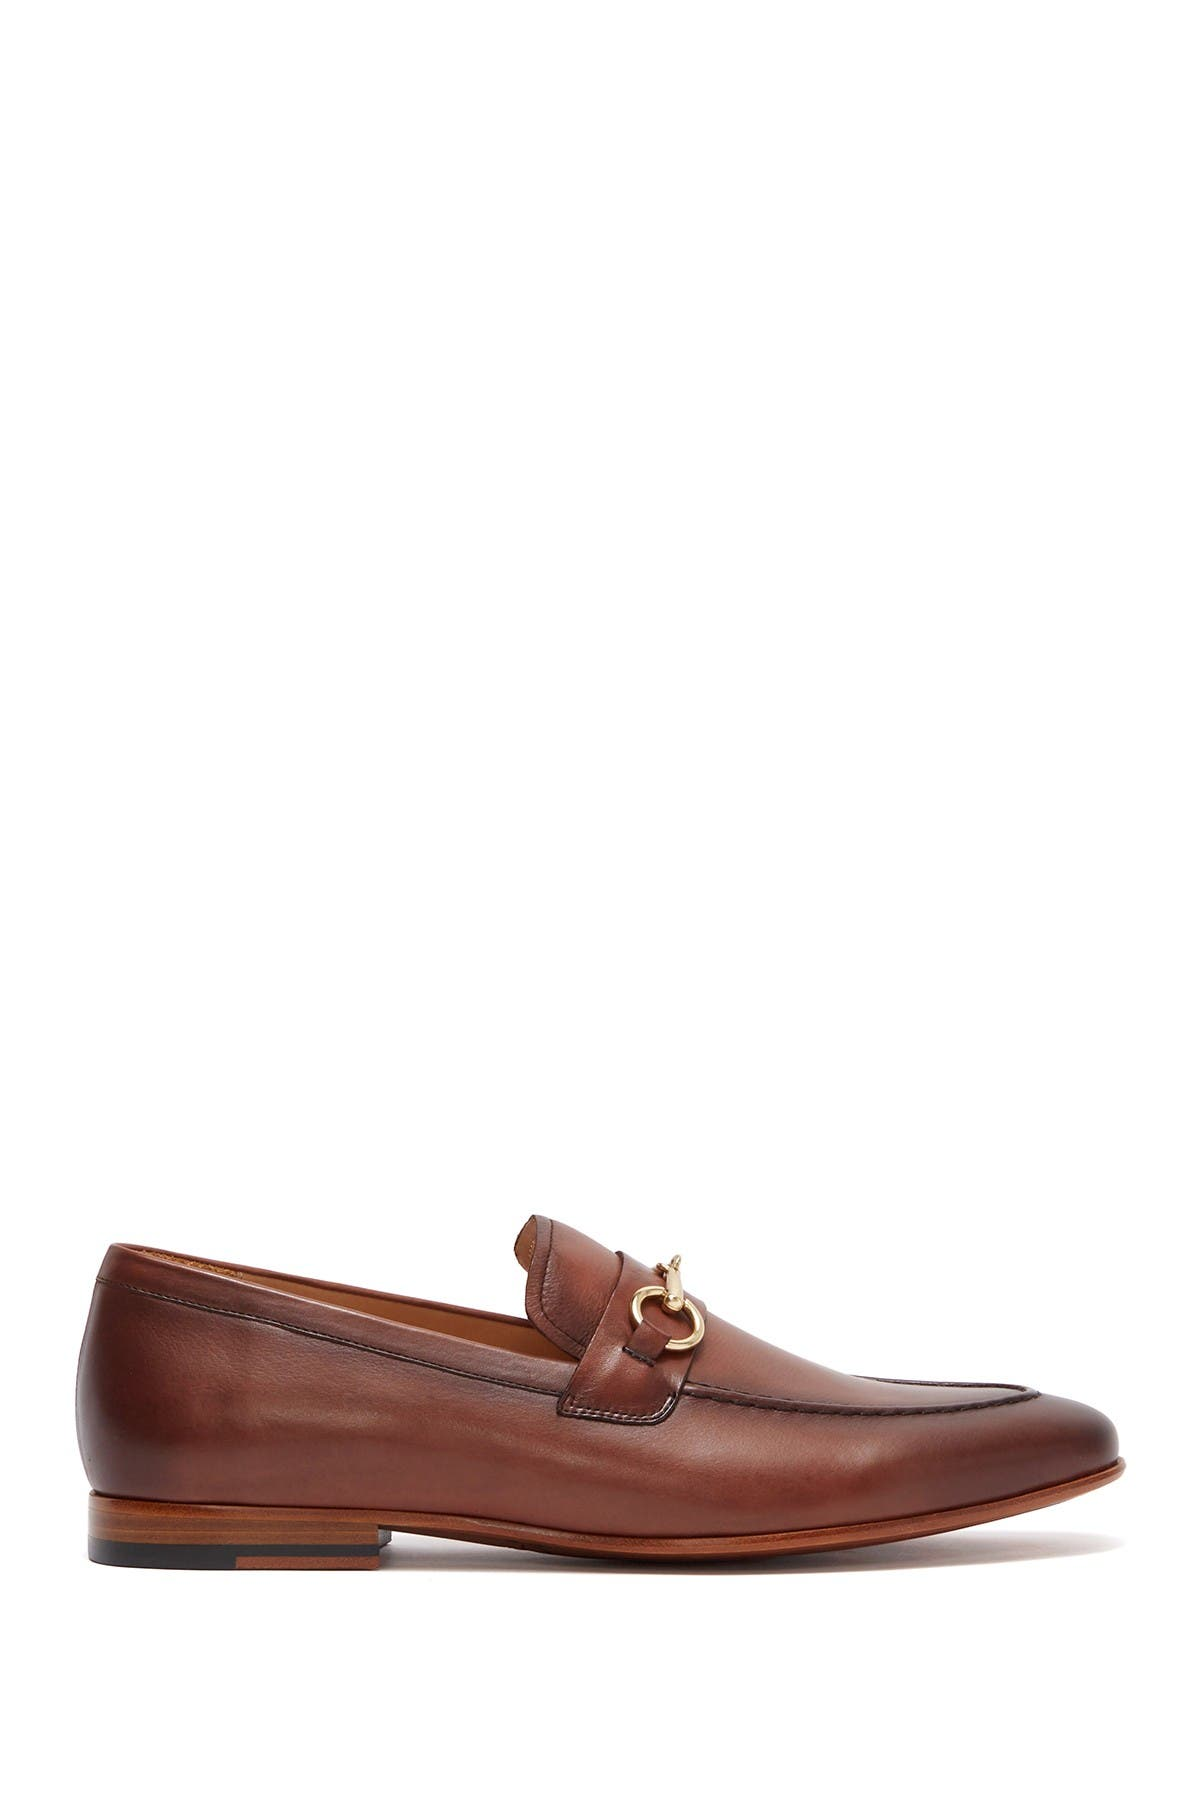 Curatore Brucato Bit Leather Loafer